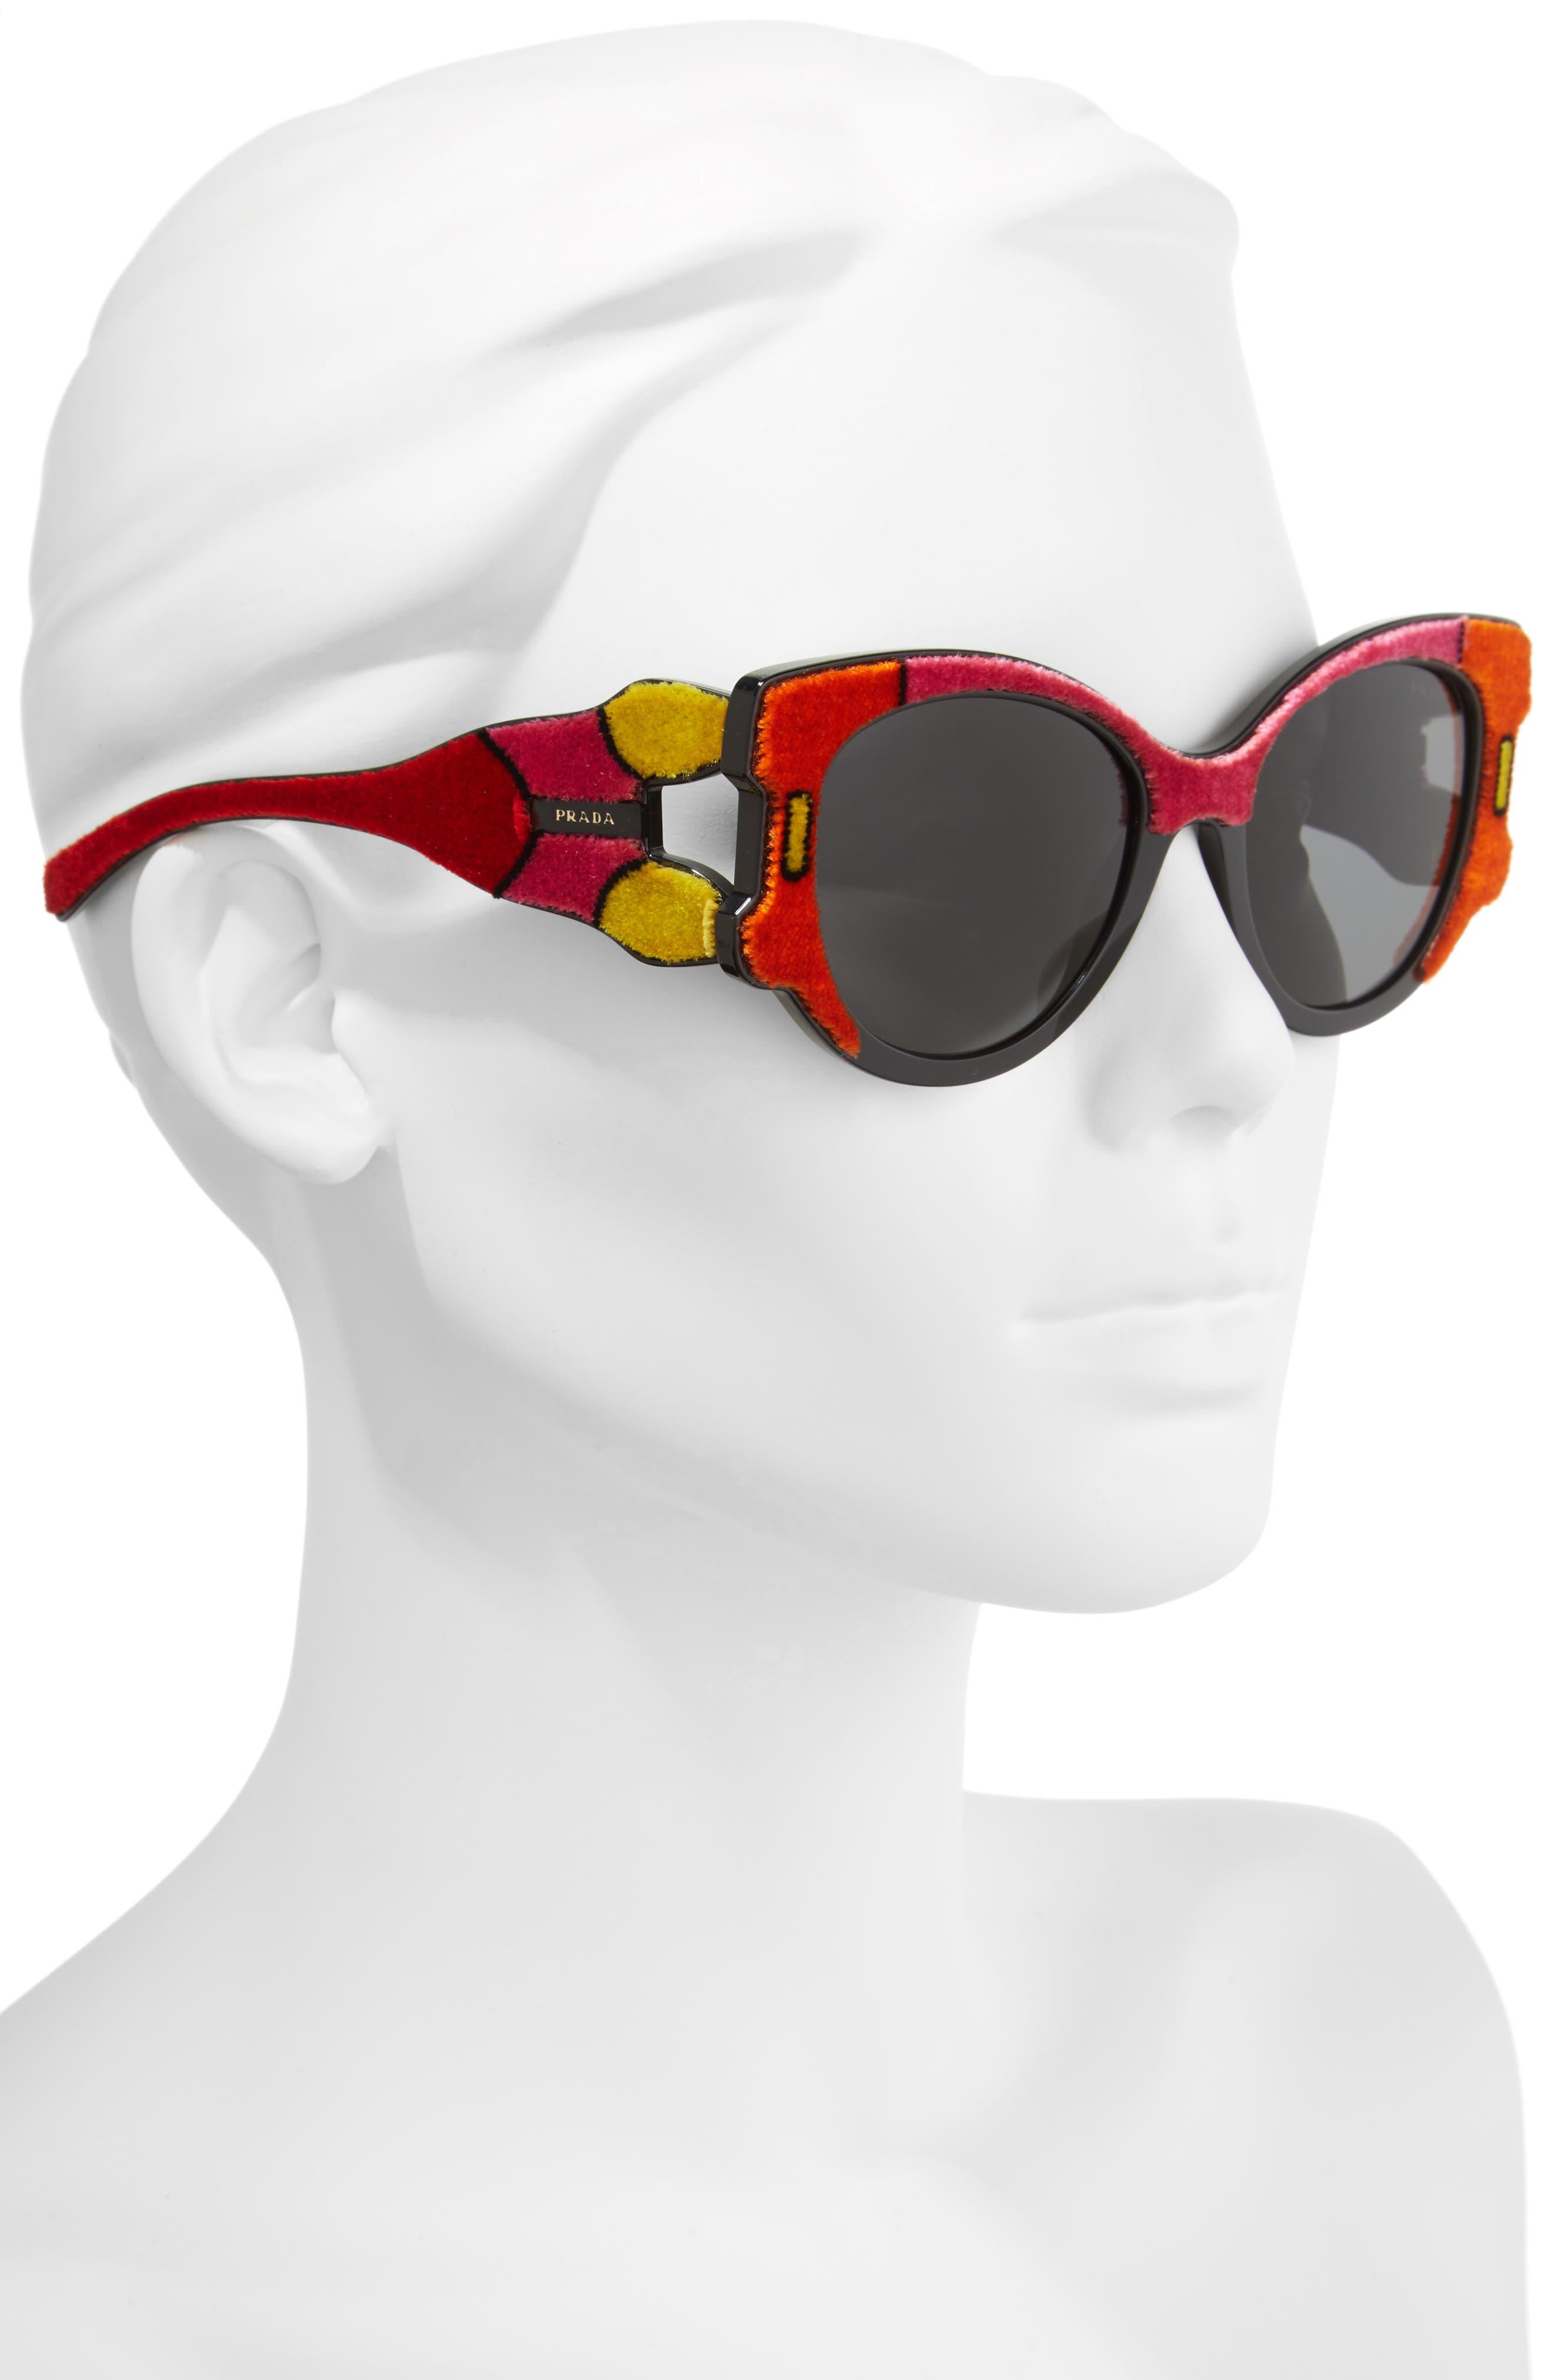 54mm Colorblock Round Sunglasses,                             Alternate thumbnail 3, color,                             010